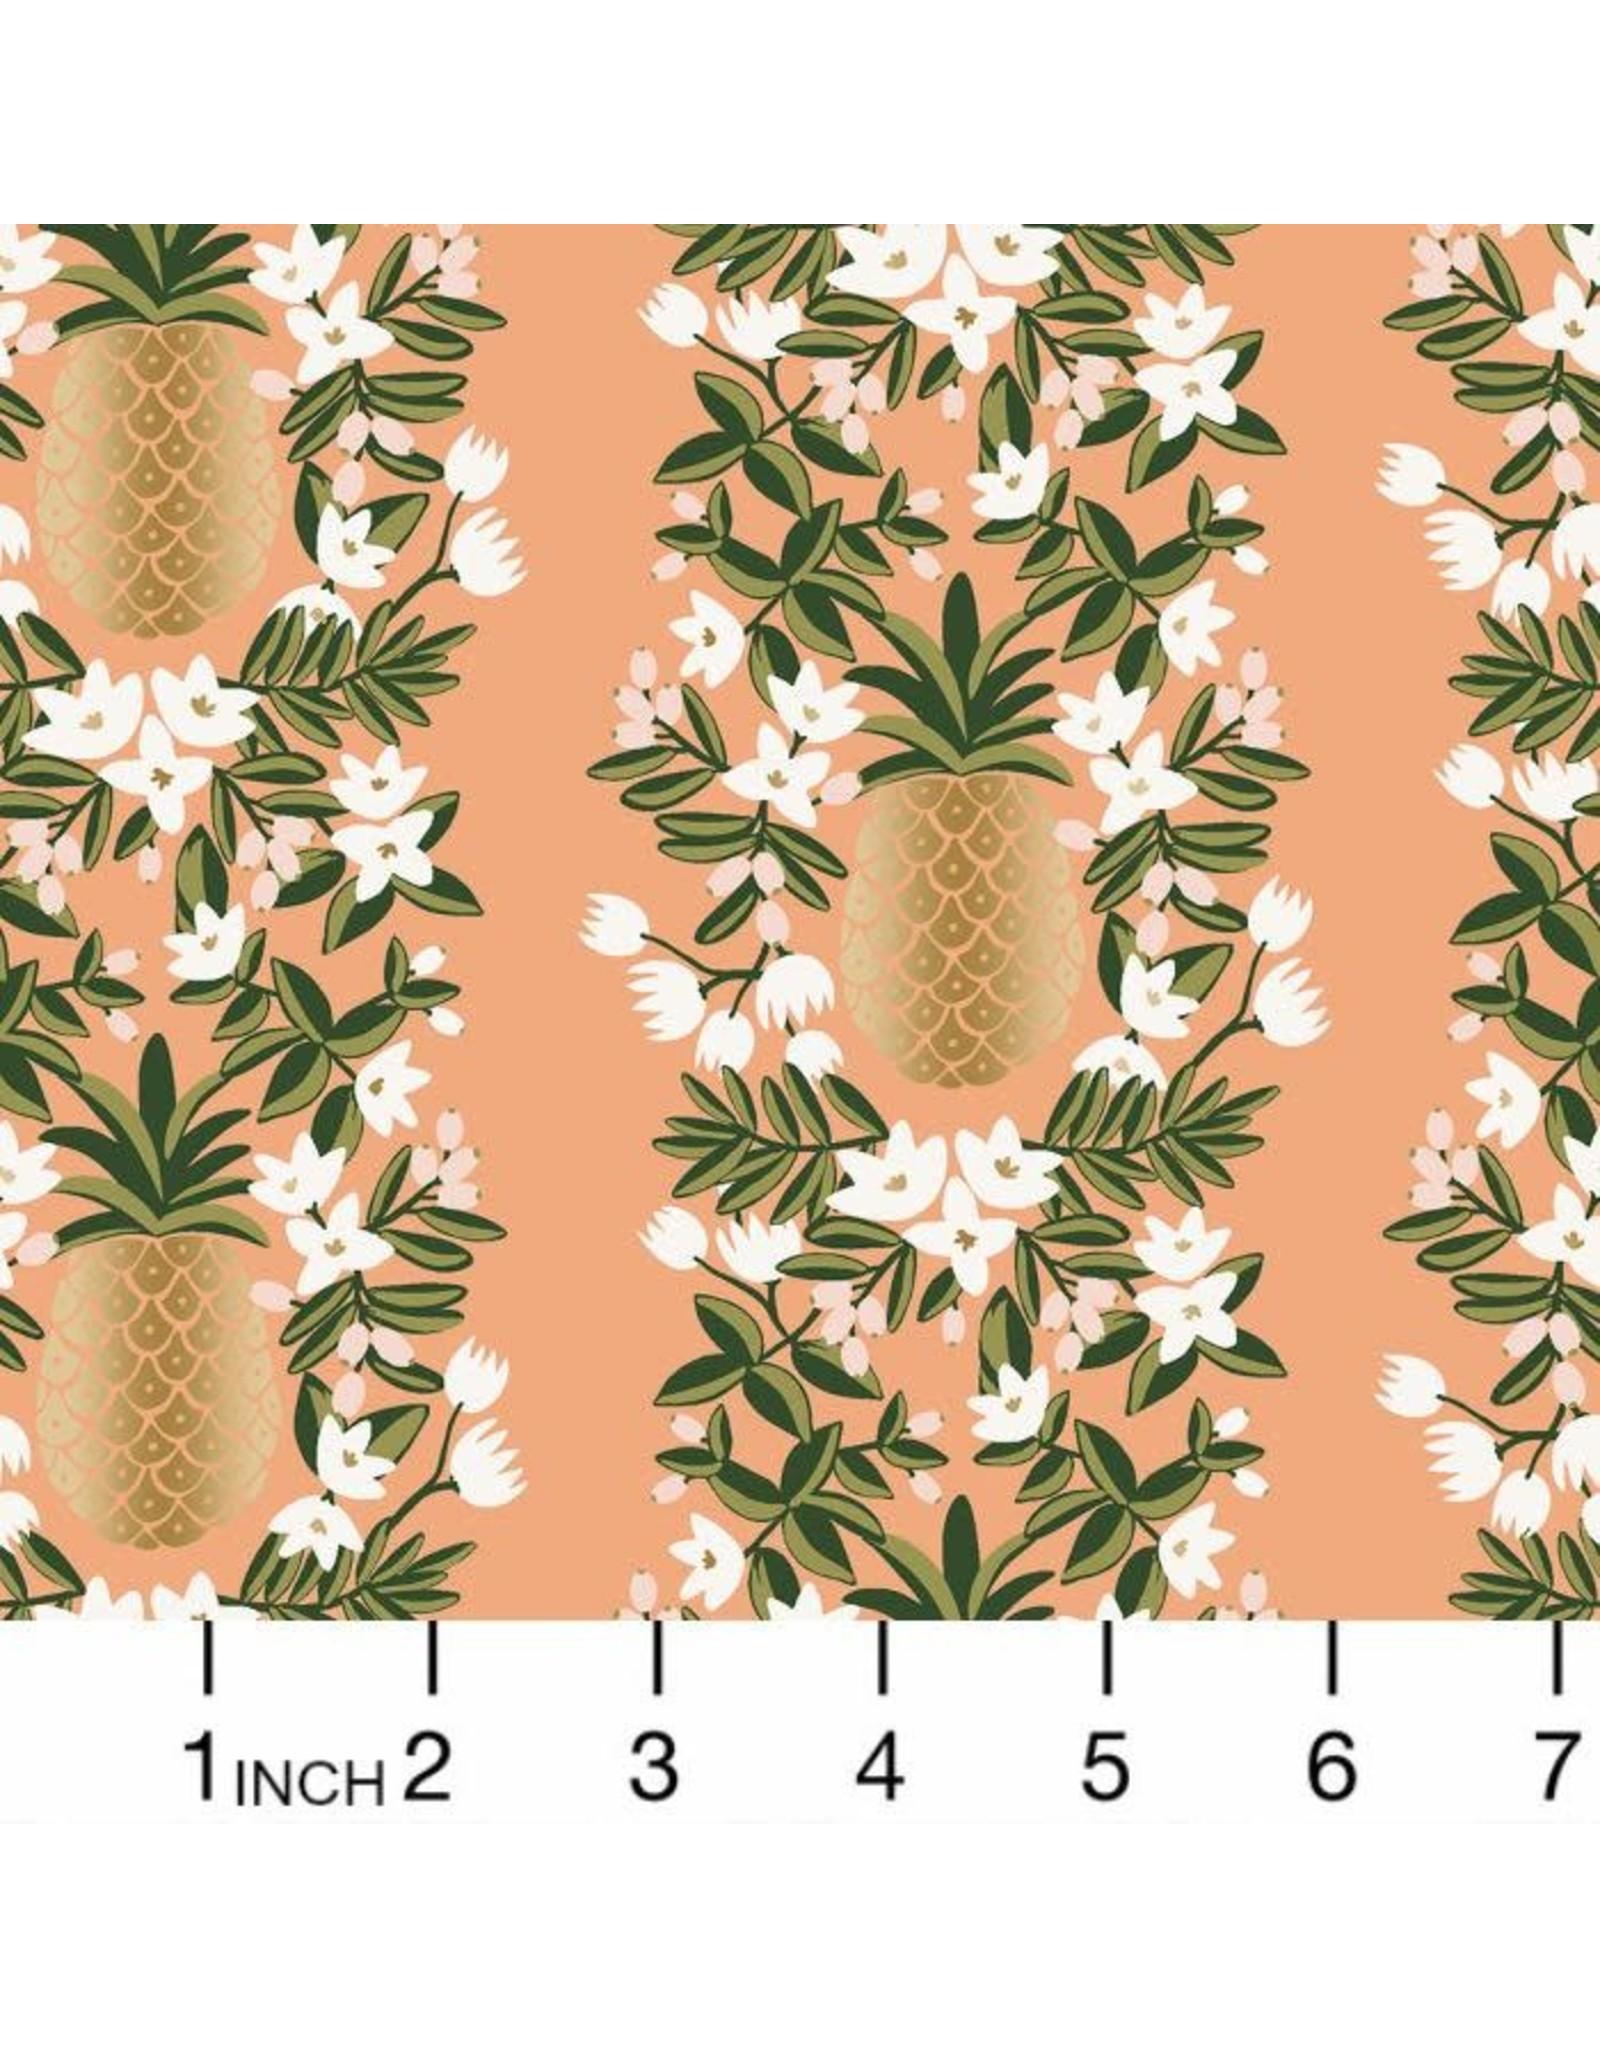 Rifle Paper Co. Primavera, Pineapple Stripe in Peach with Metallic, Fabric Half-Yards RP302-PH3M